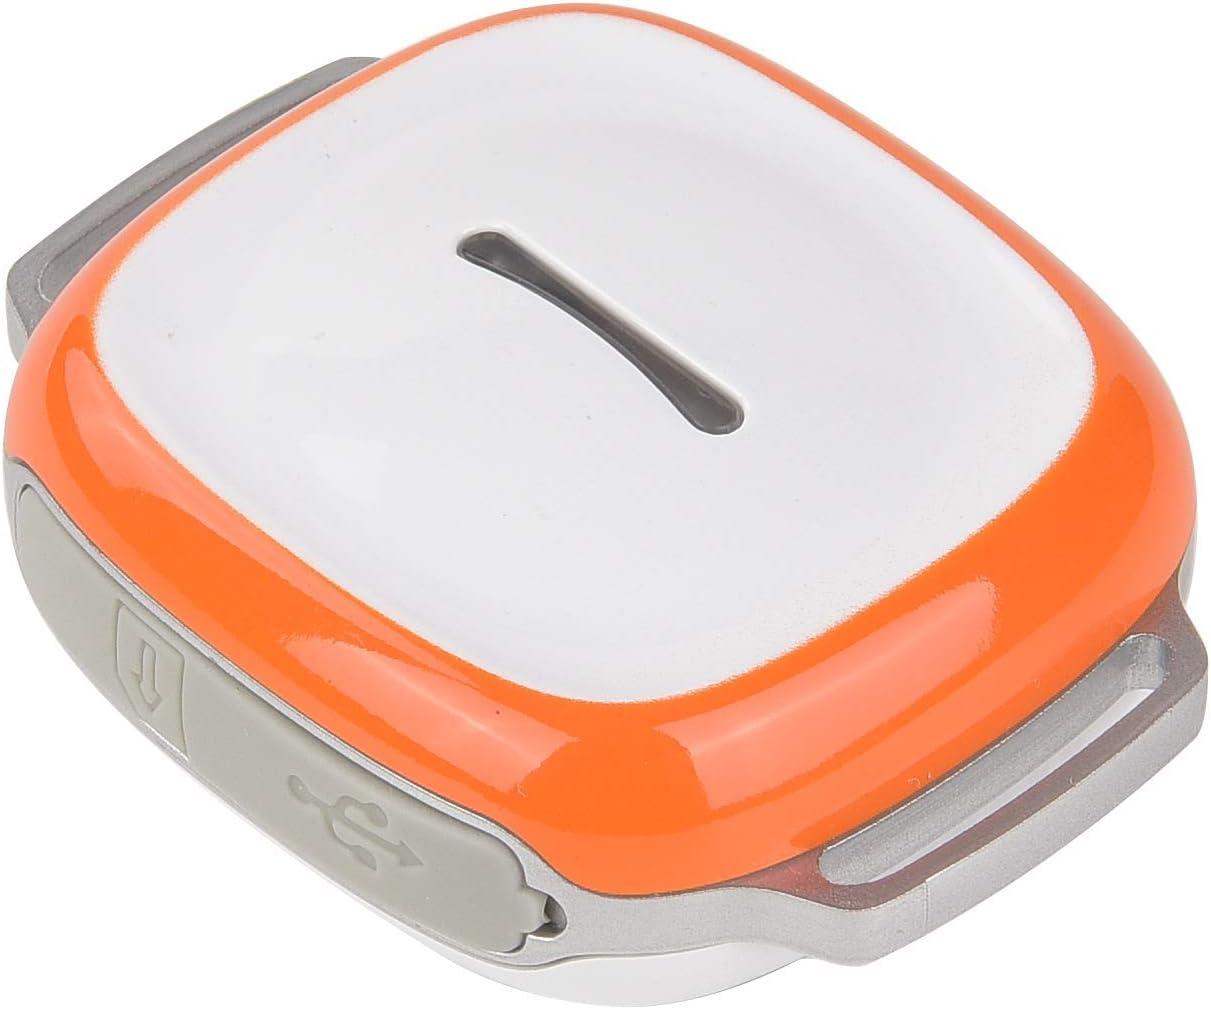 Mini GPS Localizador de Mascotas Rastreador para Perros Gatos Ganado, Anti-pérdida Anti-Theft Anti-Fall Rastreador GPS con Collar Alarma inalámbrica de batería Baja Llamadas remotas,Naranja